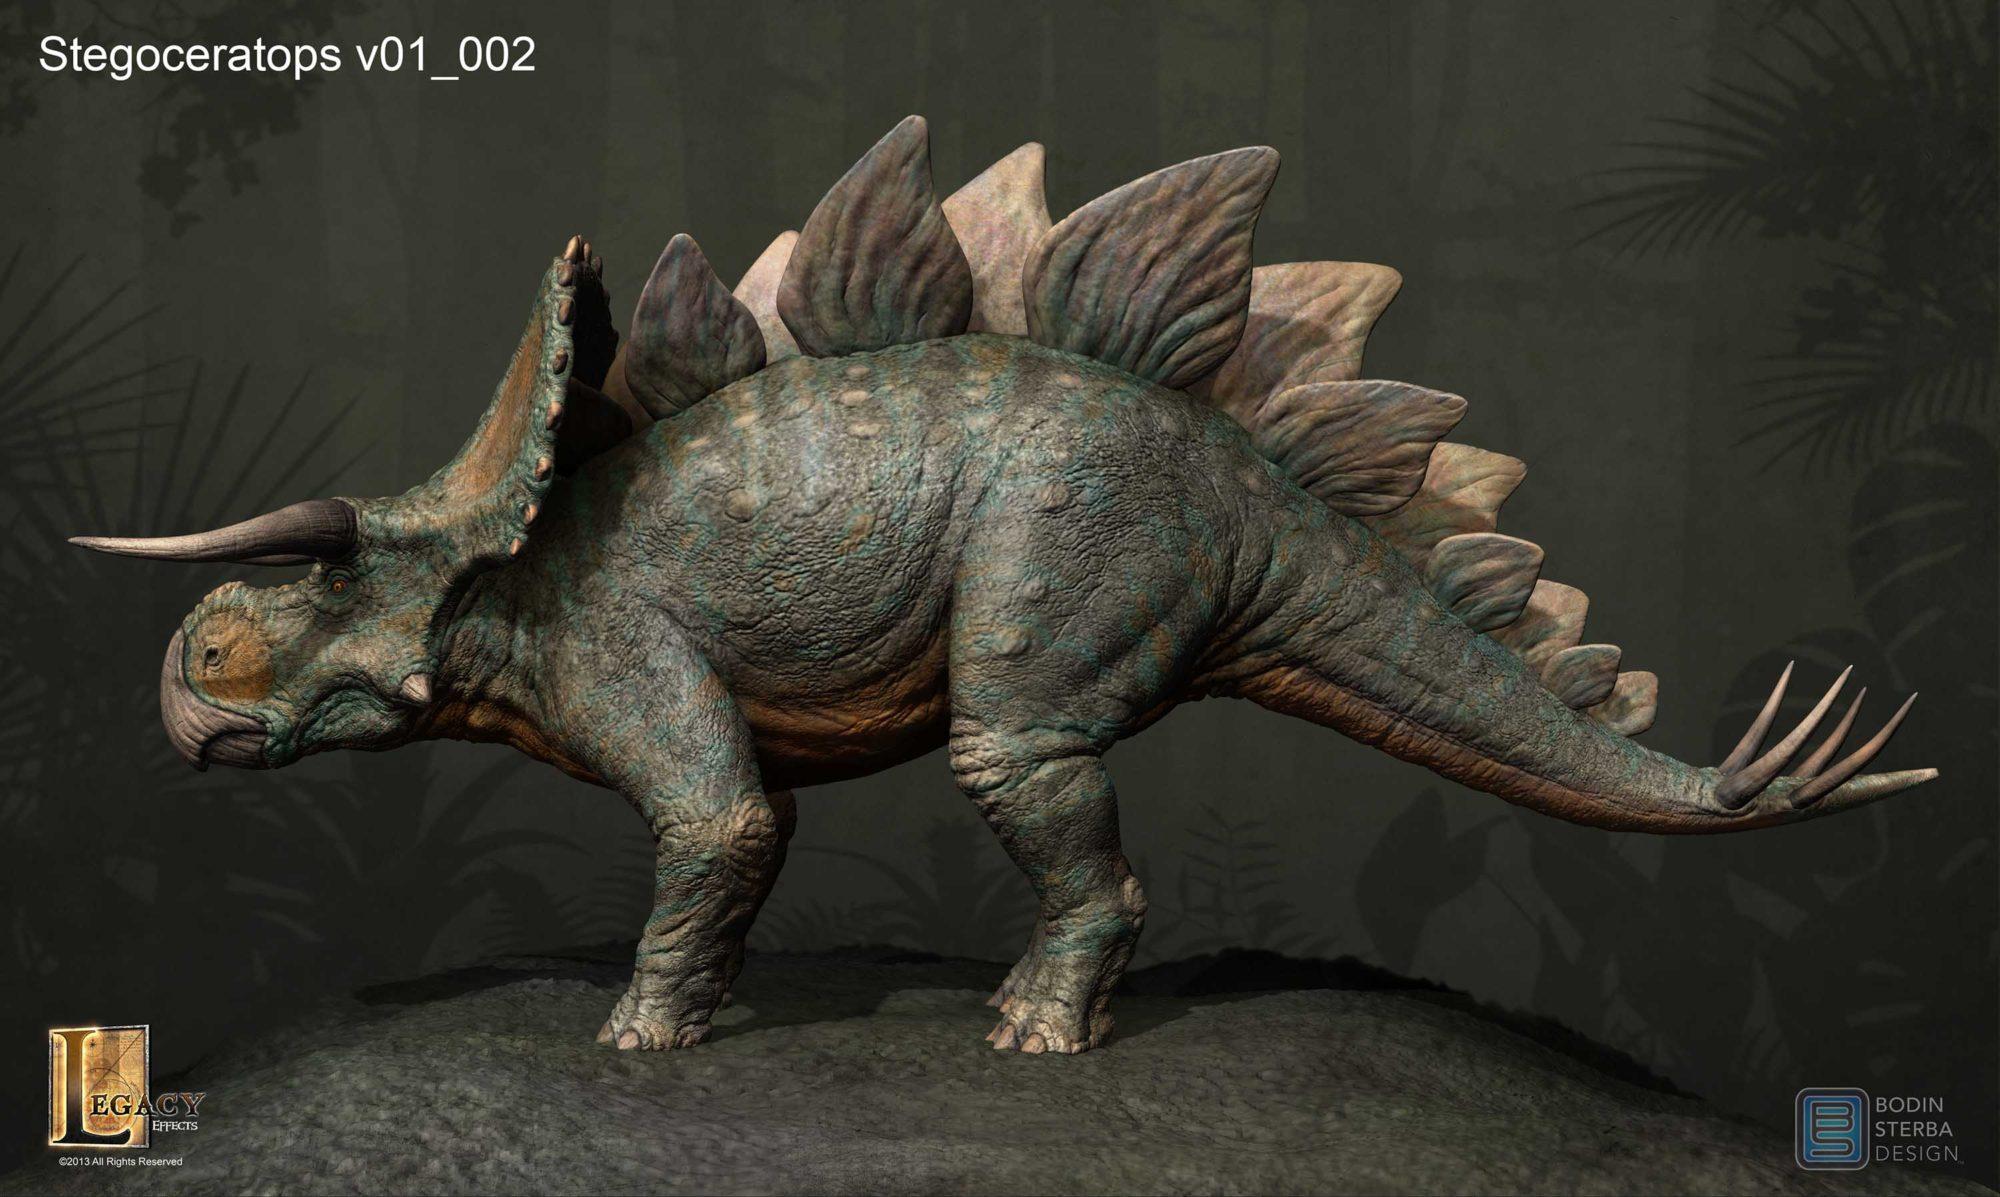 Jurassic world dino designs bodin sterba design - Dinosaure jurassic world ...